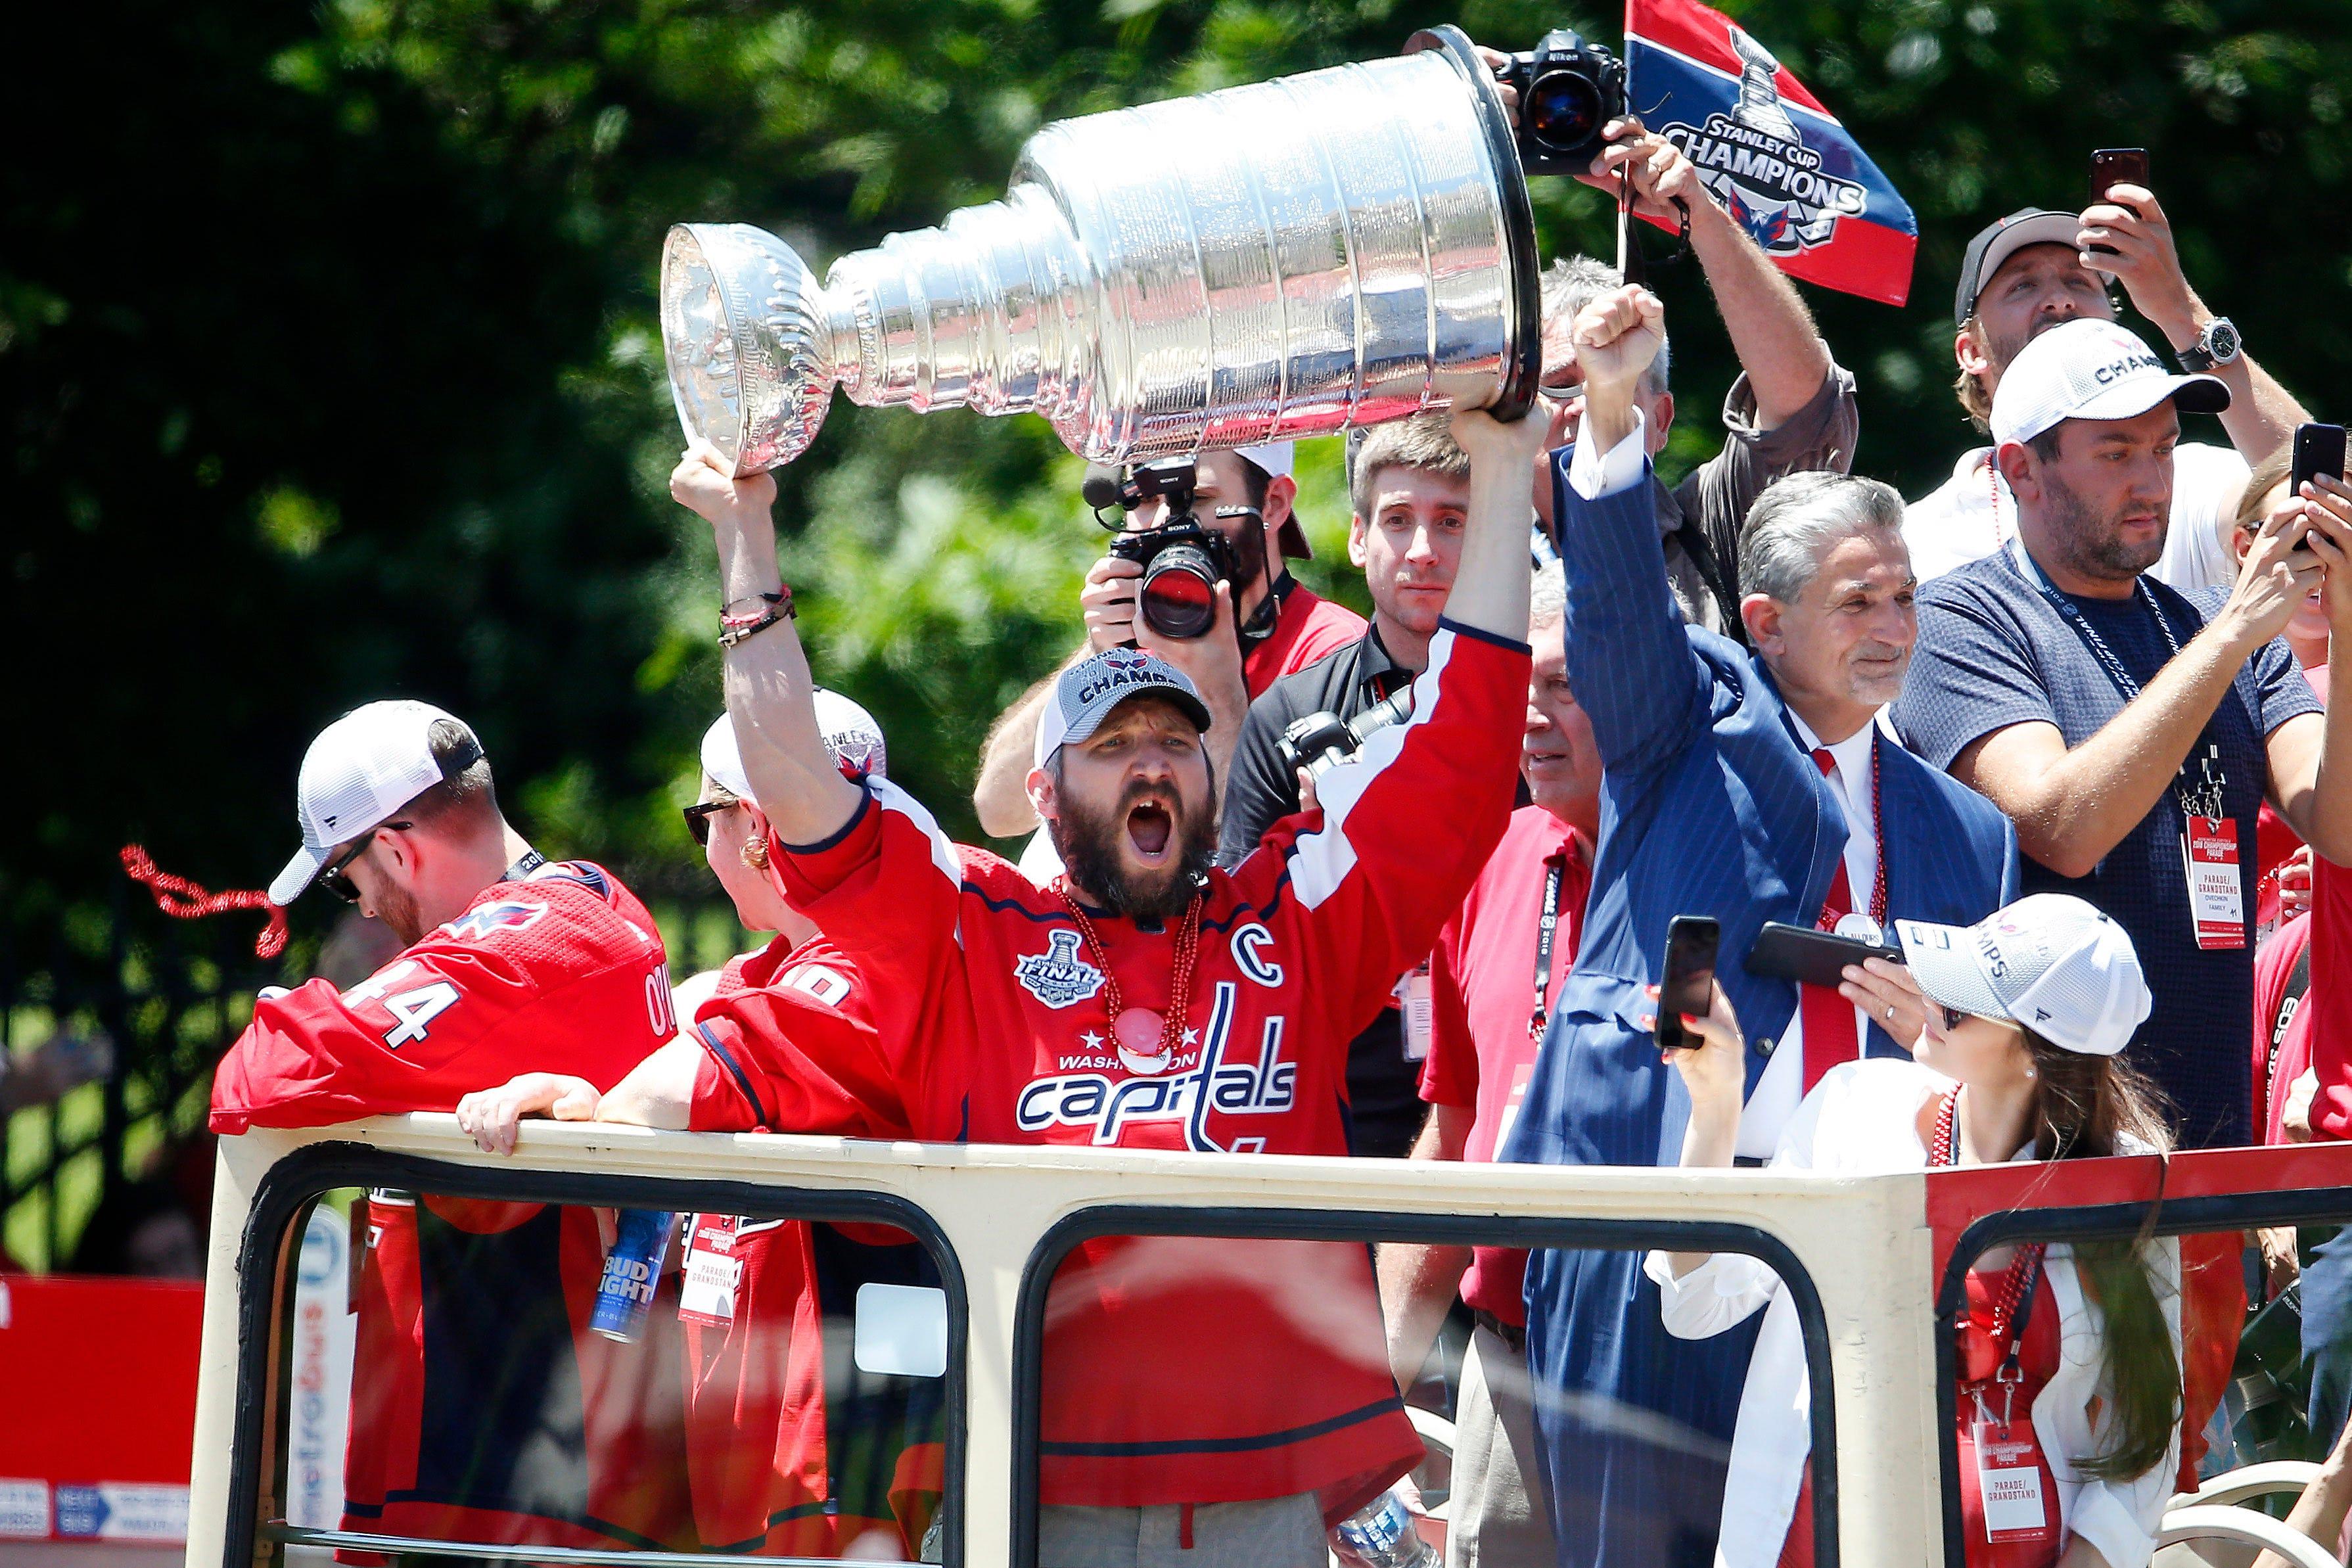 307df034def 636644103764364415-USP-NHL--Washington-Capitals-Stanley-Cup-Champions.9.jpg